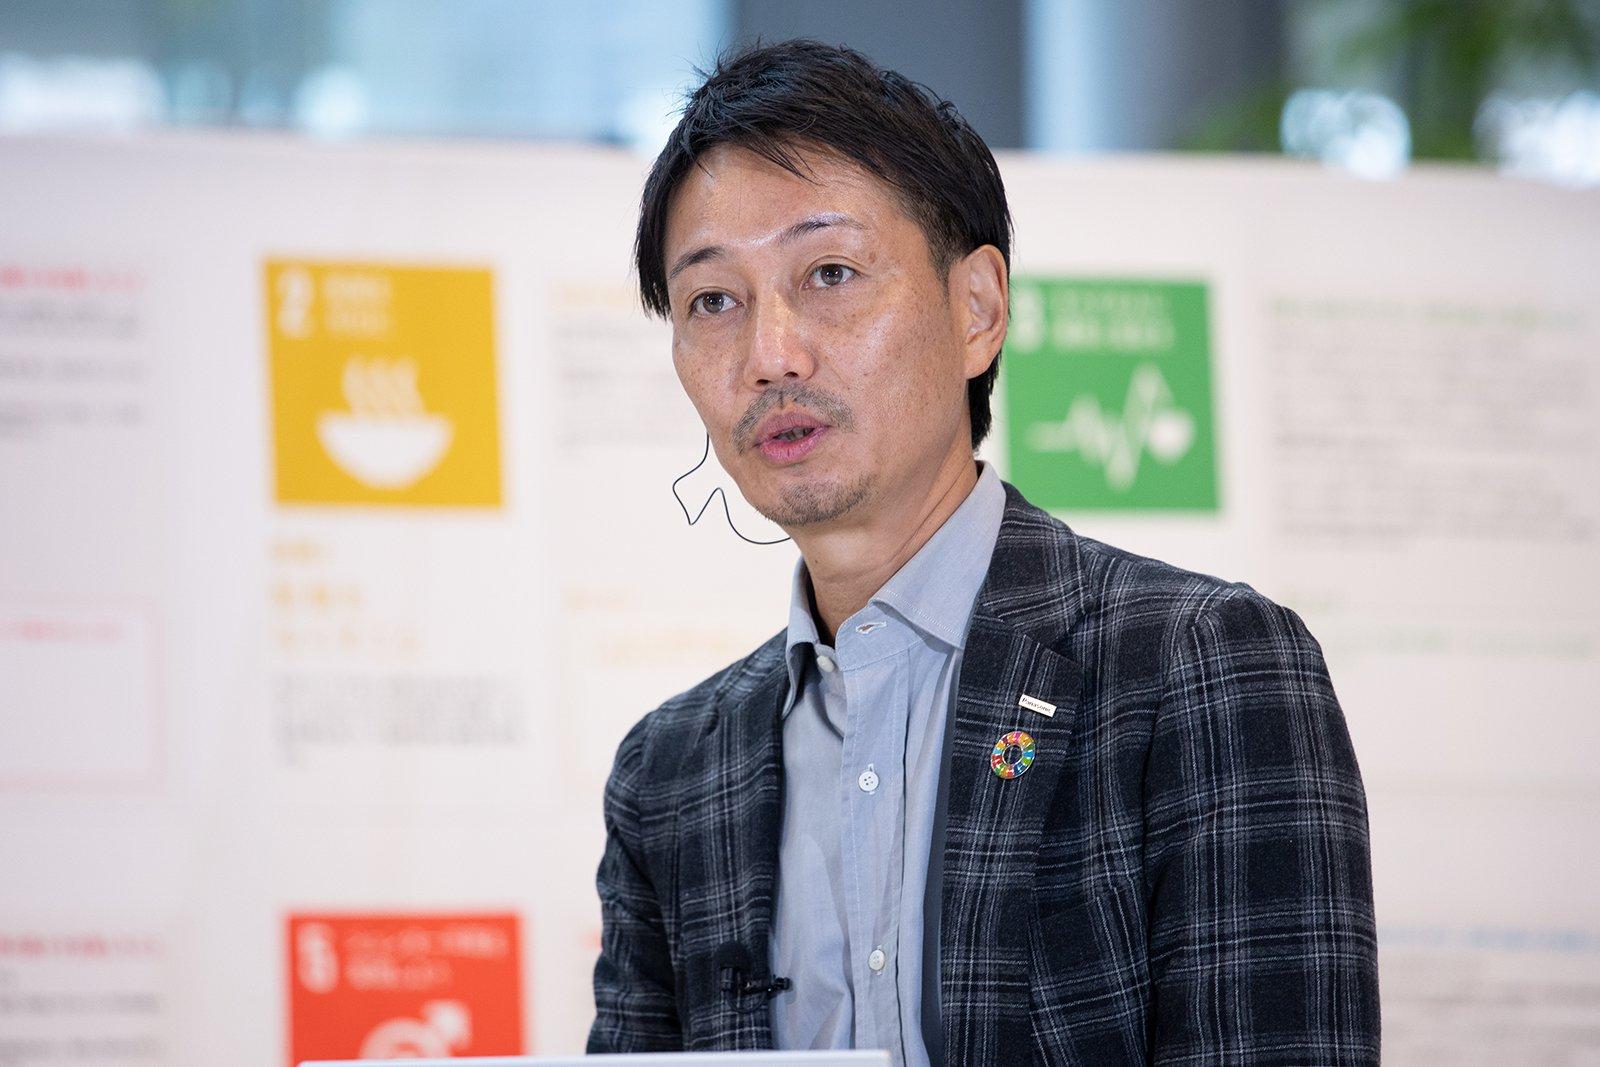 Photo: Alex Ikenouchi, Director, Panasonic Center Tokyo, Groupwide Brand Strategy Division, Panasonic Corporation